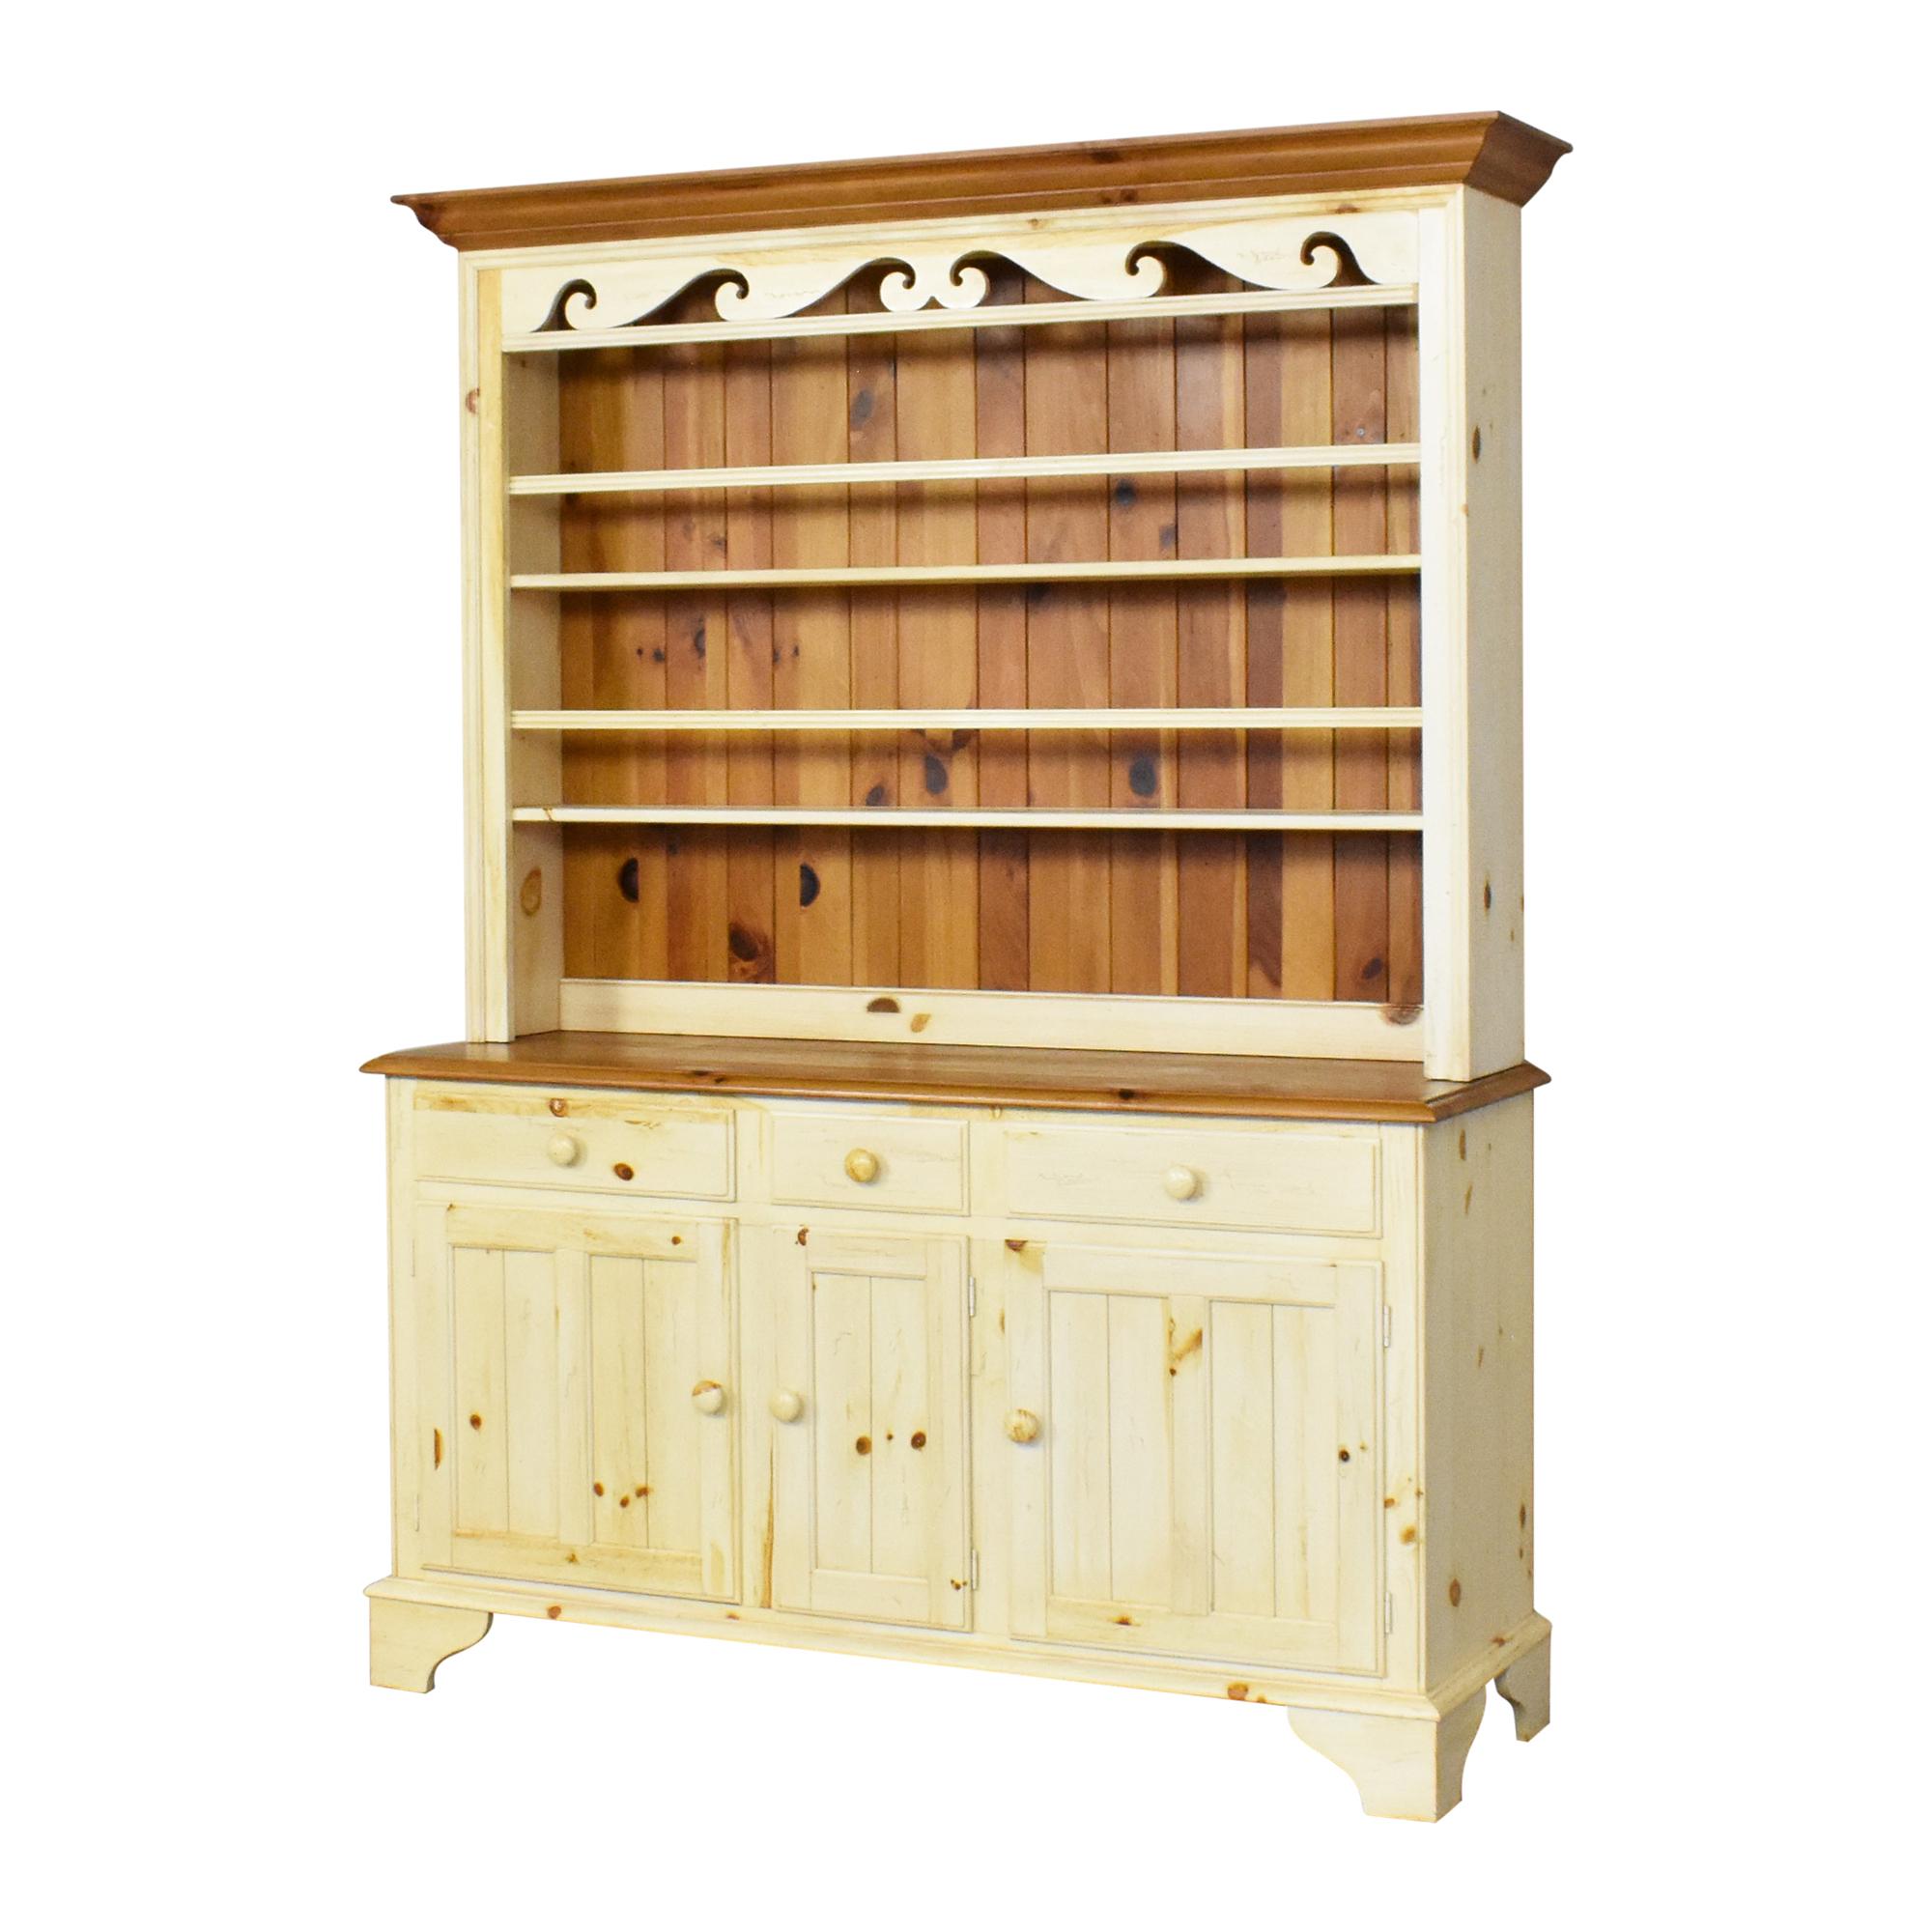 Ethan Allen Ethan Allen Farmhouse Cabinet with Hutch dimensions